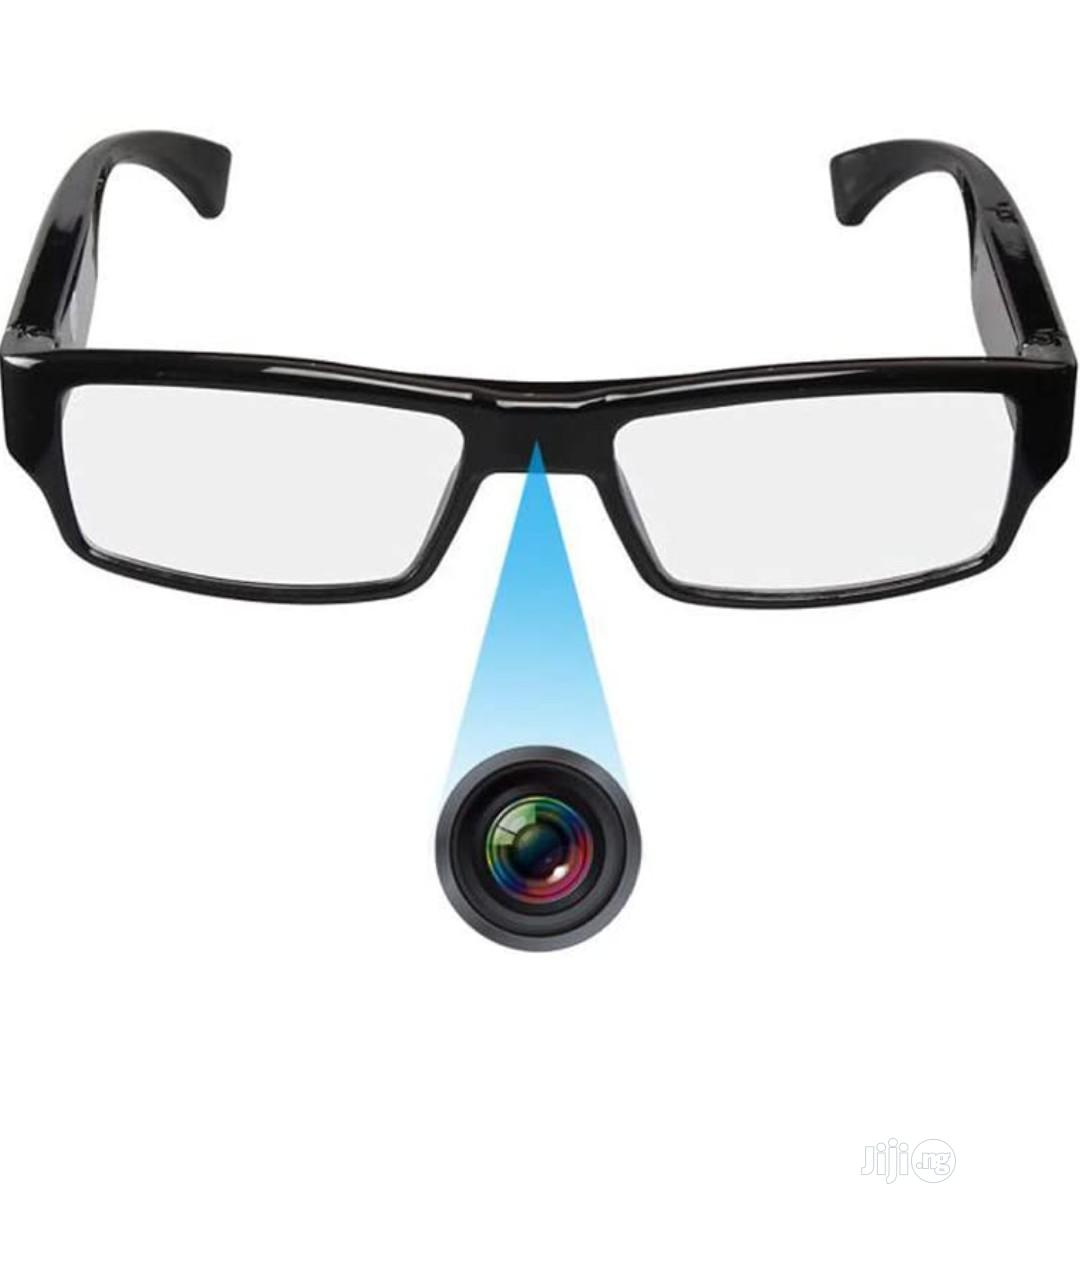 Archive: Spy Camera Glasses,1080P Spy Glasses With Hidden Camera